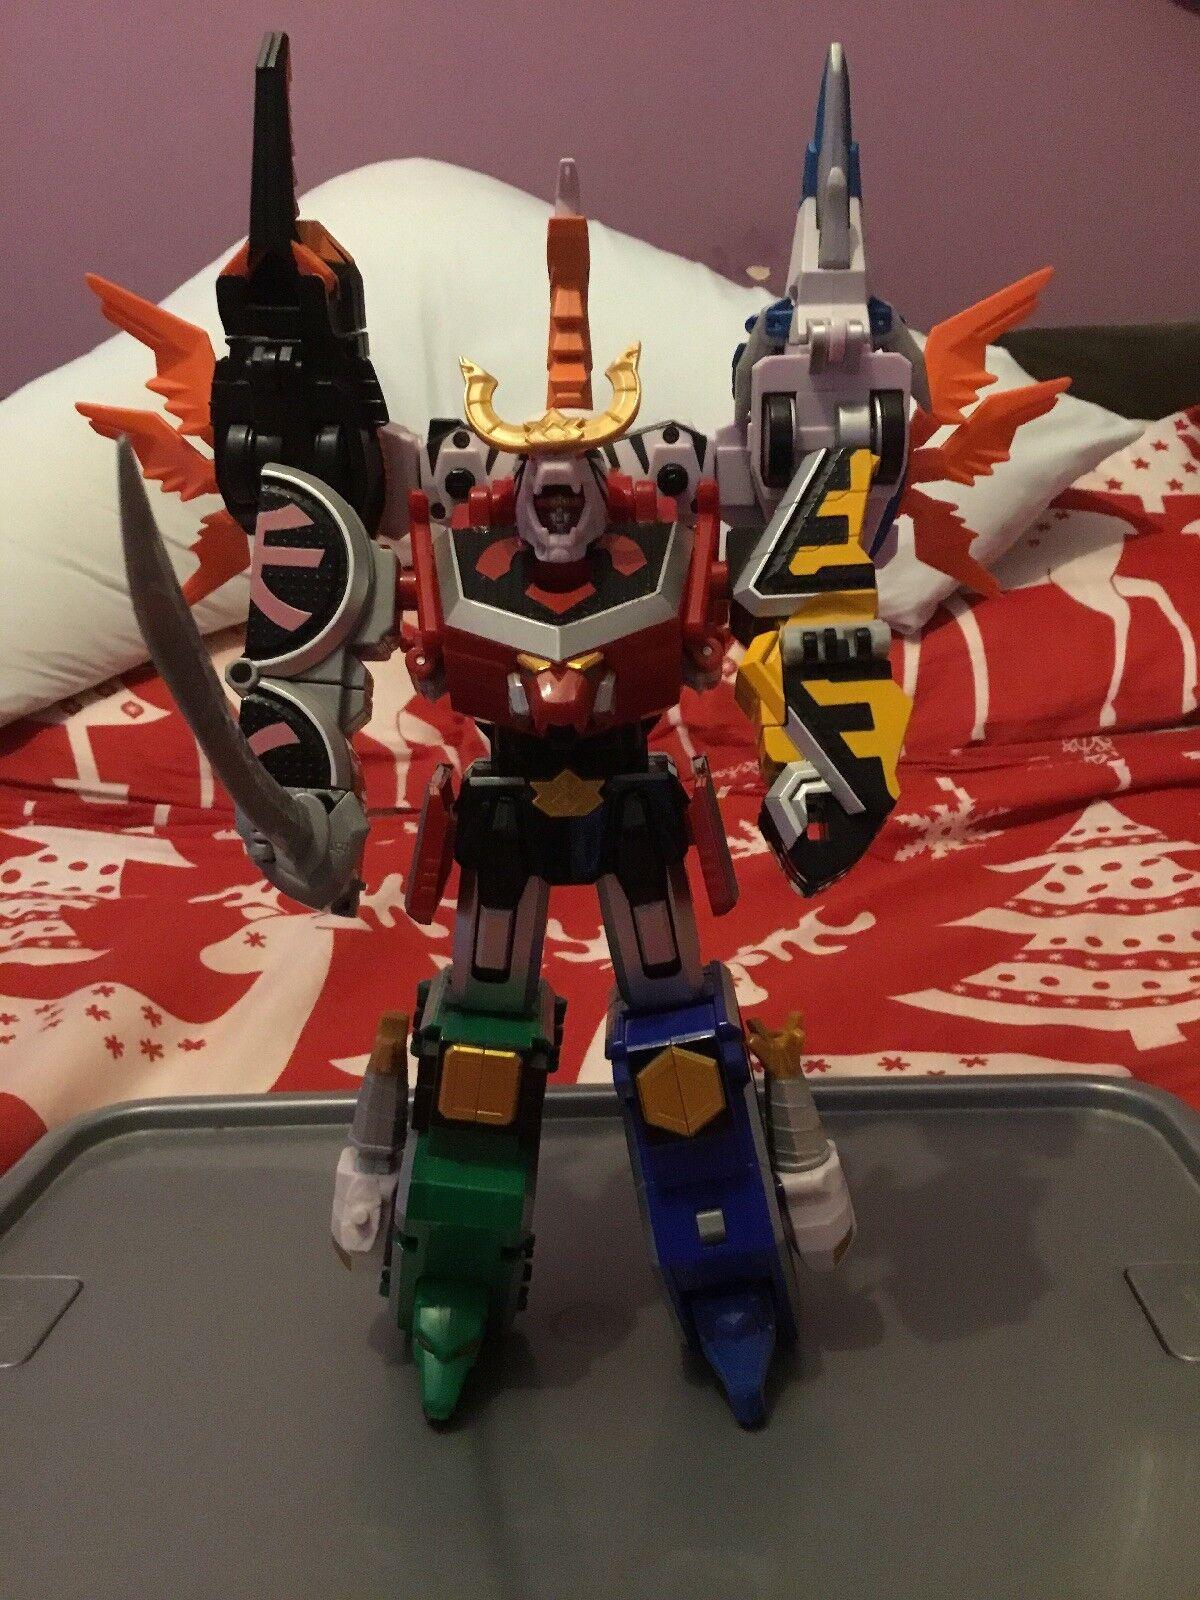 Power Rangers Samurai Deluxe battlewing Megazord + 3 Ranger Figures